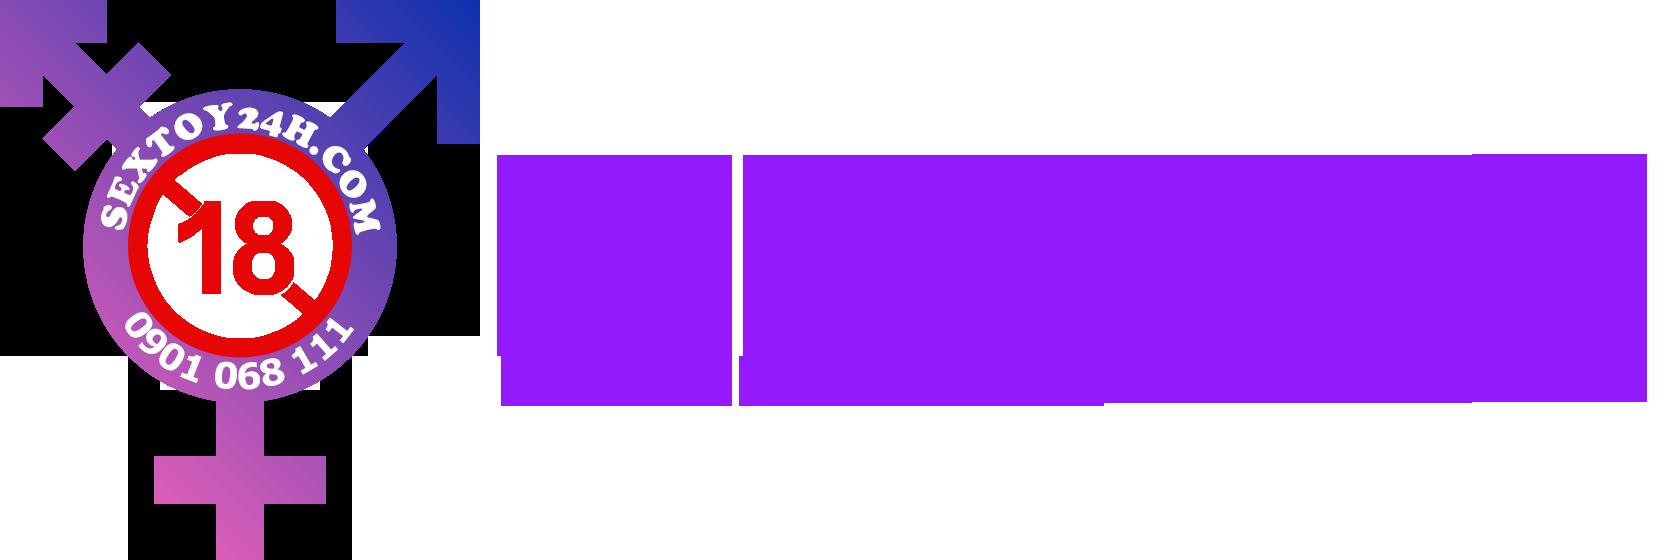 SexToy Chính Hãng – Sextoy 24h